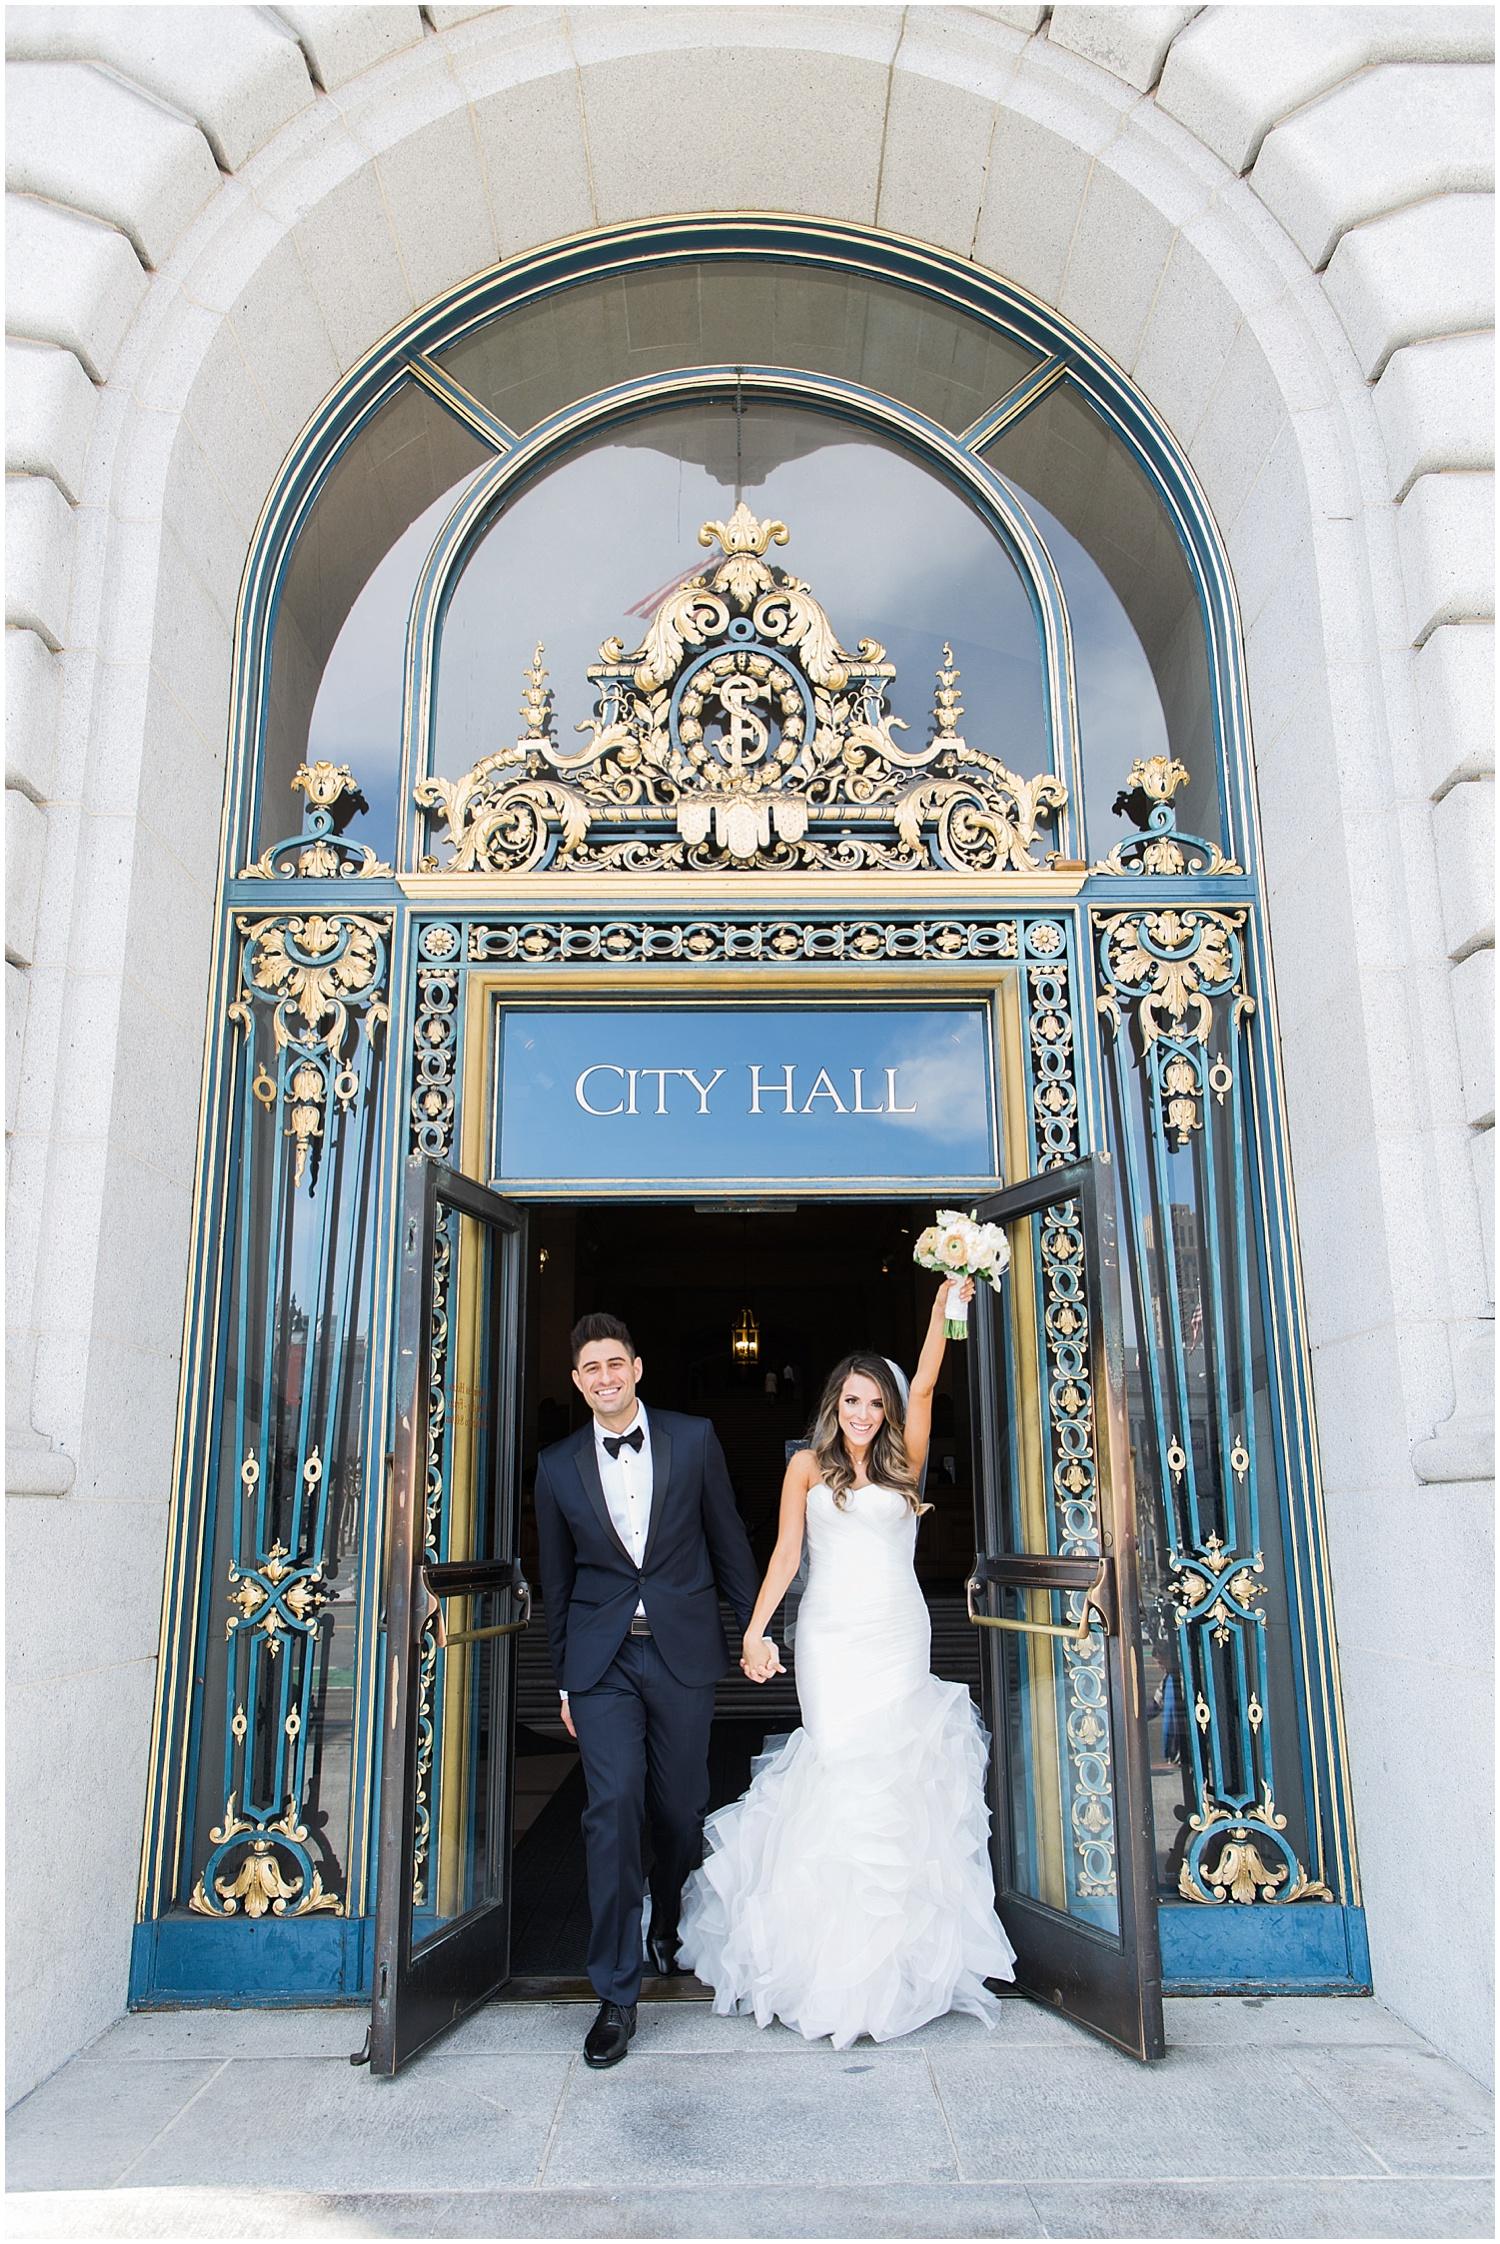 Best_SF_ctiy_hall_wedding_photographer-019.jpg